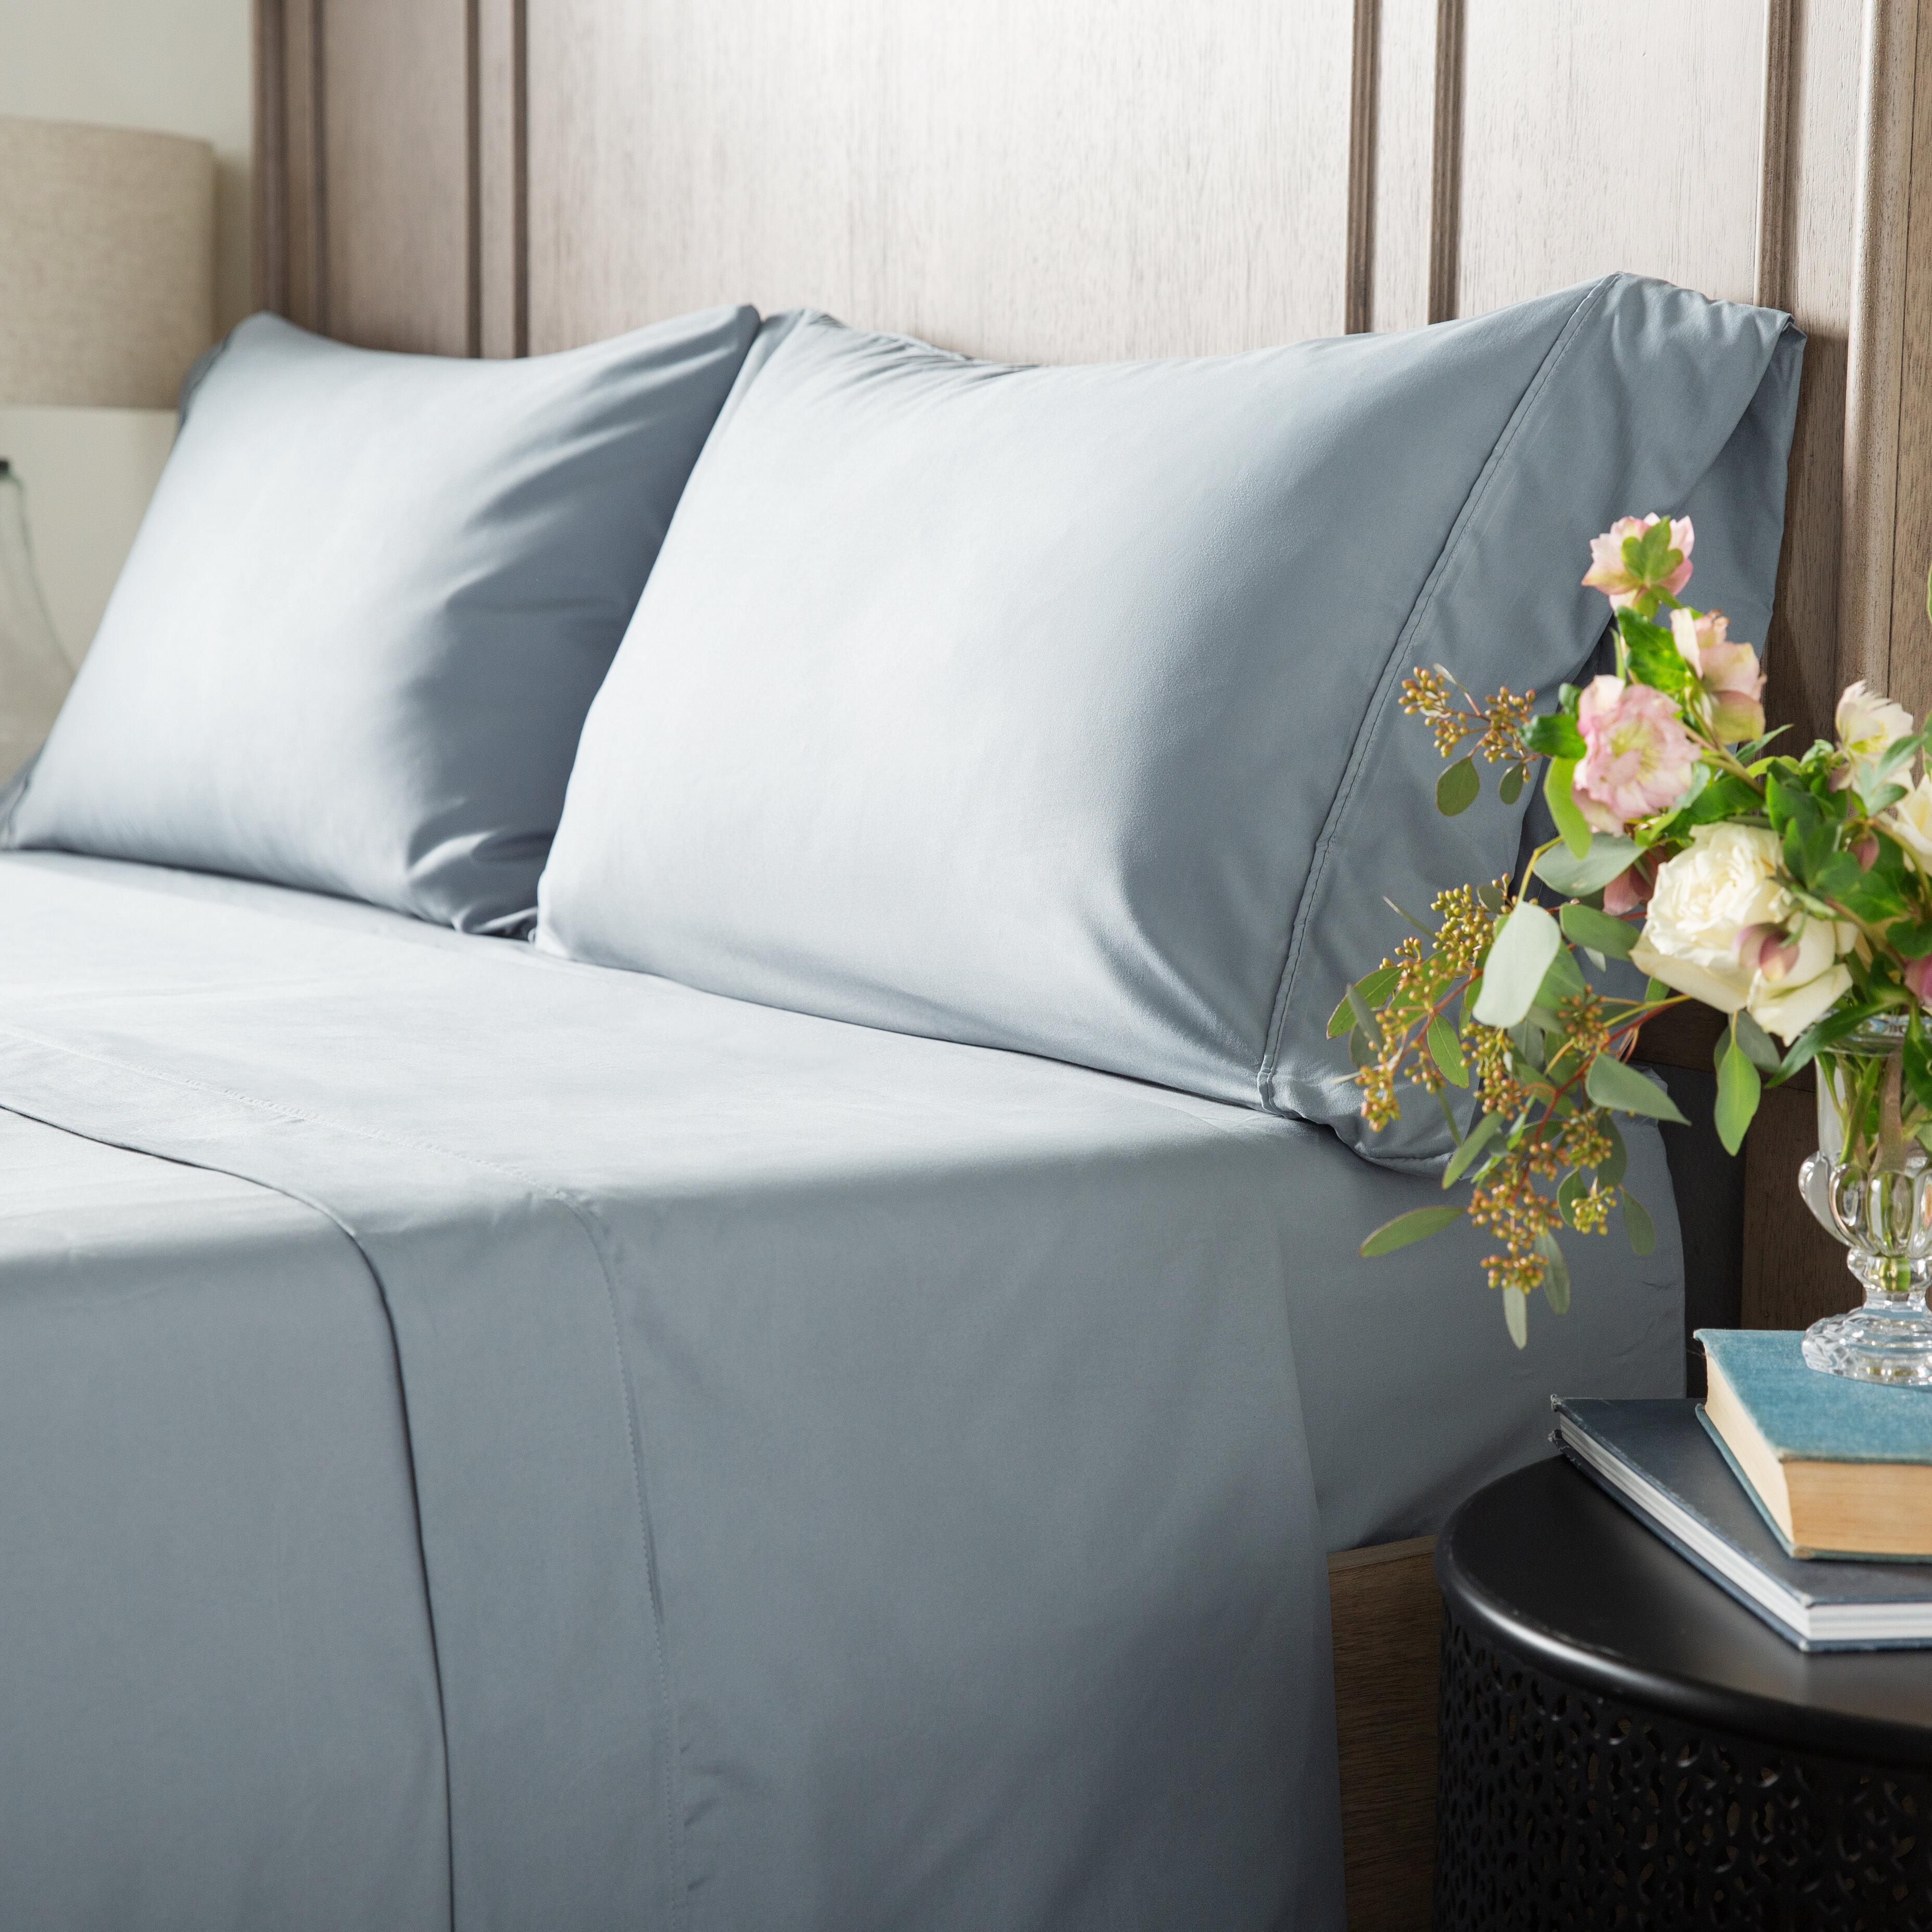 Paris Theme Bedding Sheets Pillowcases You Ll Love In 2021 Wayfair